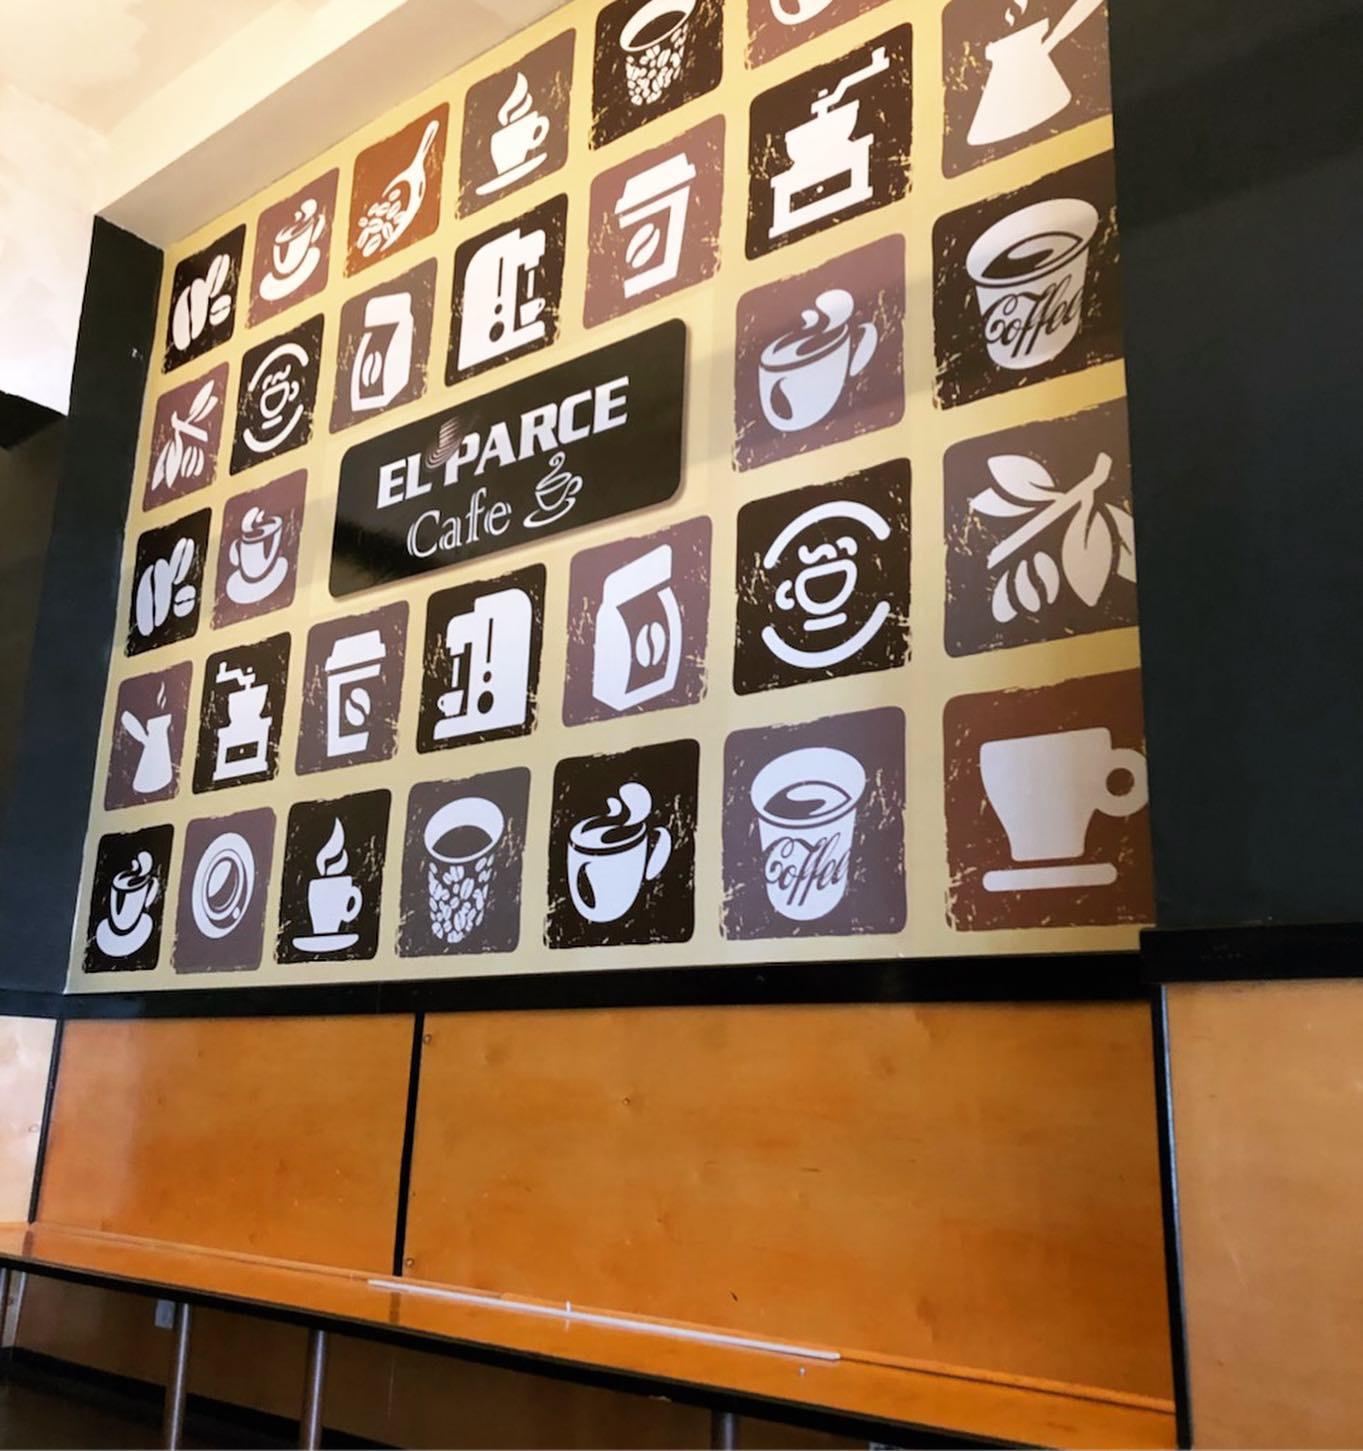 Cafe interior wall